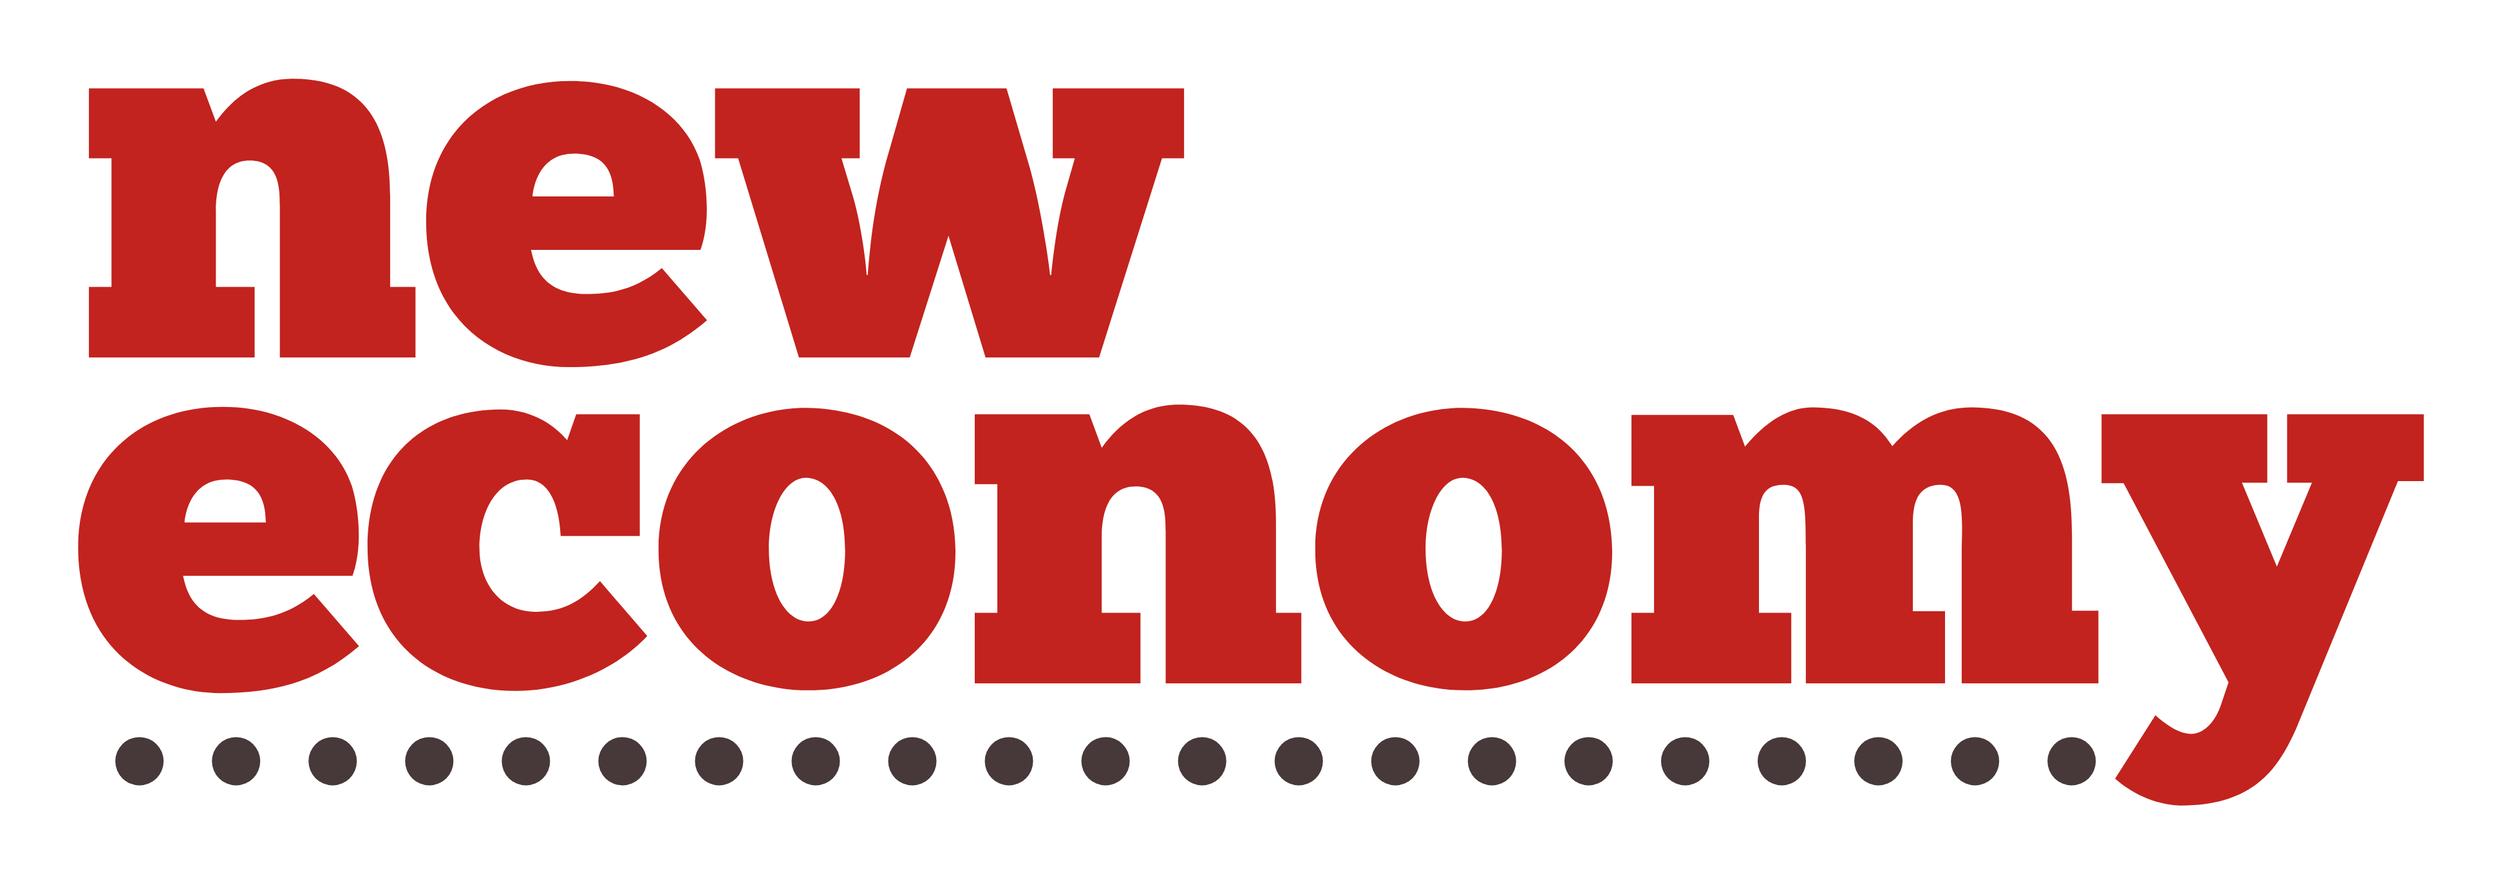 1905 - new economy logo - white background (1).png